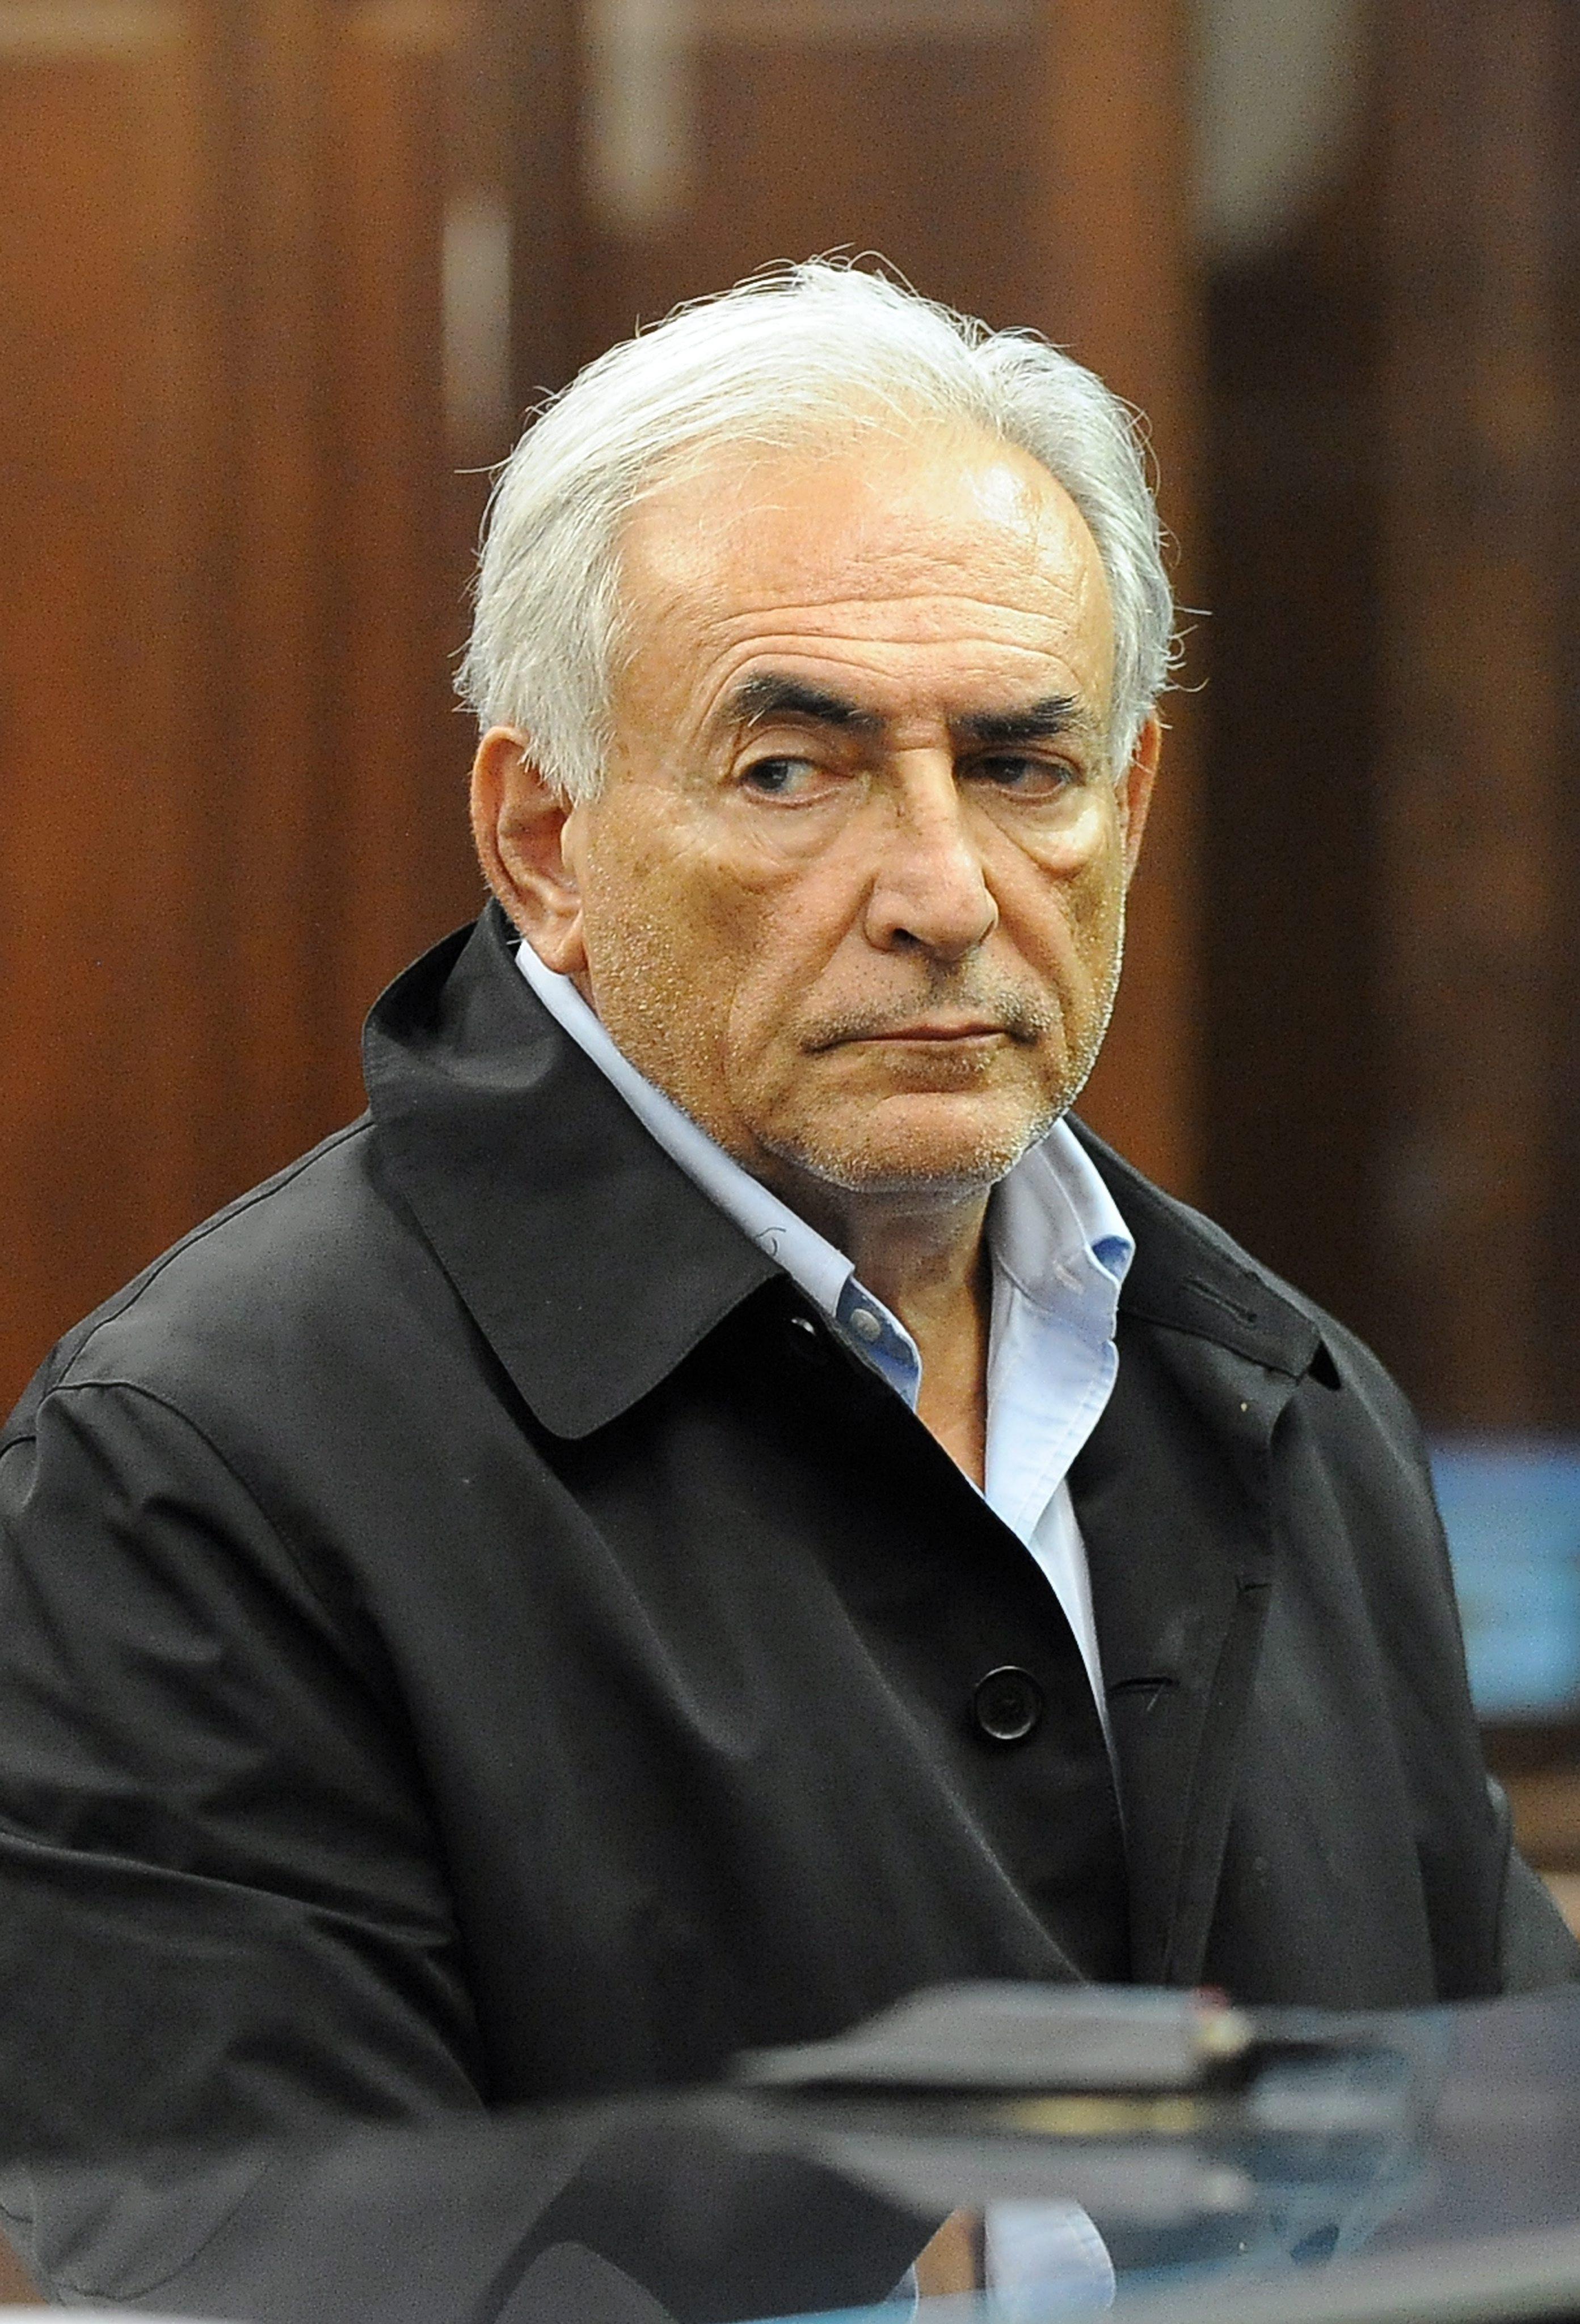 Строс-Кан подал оставка с омерзение